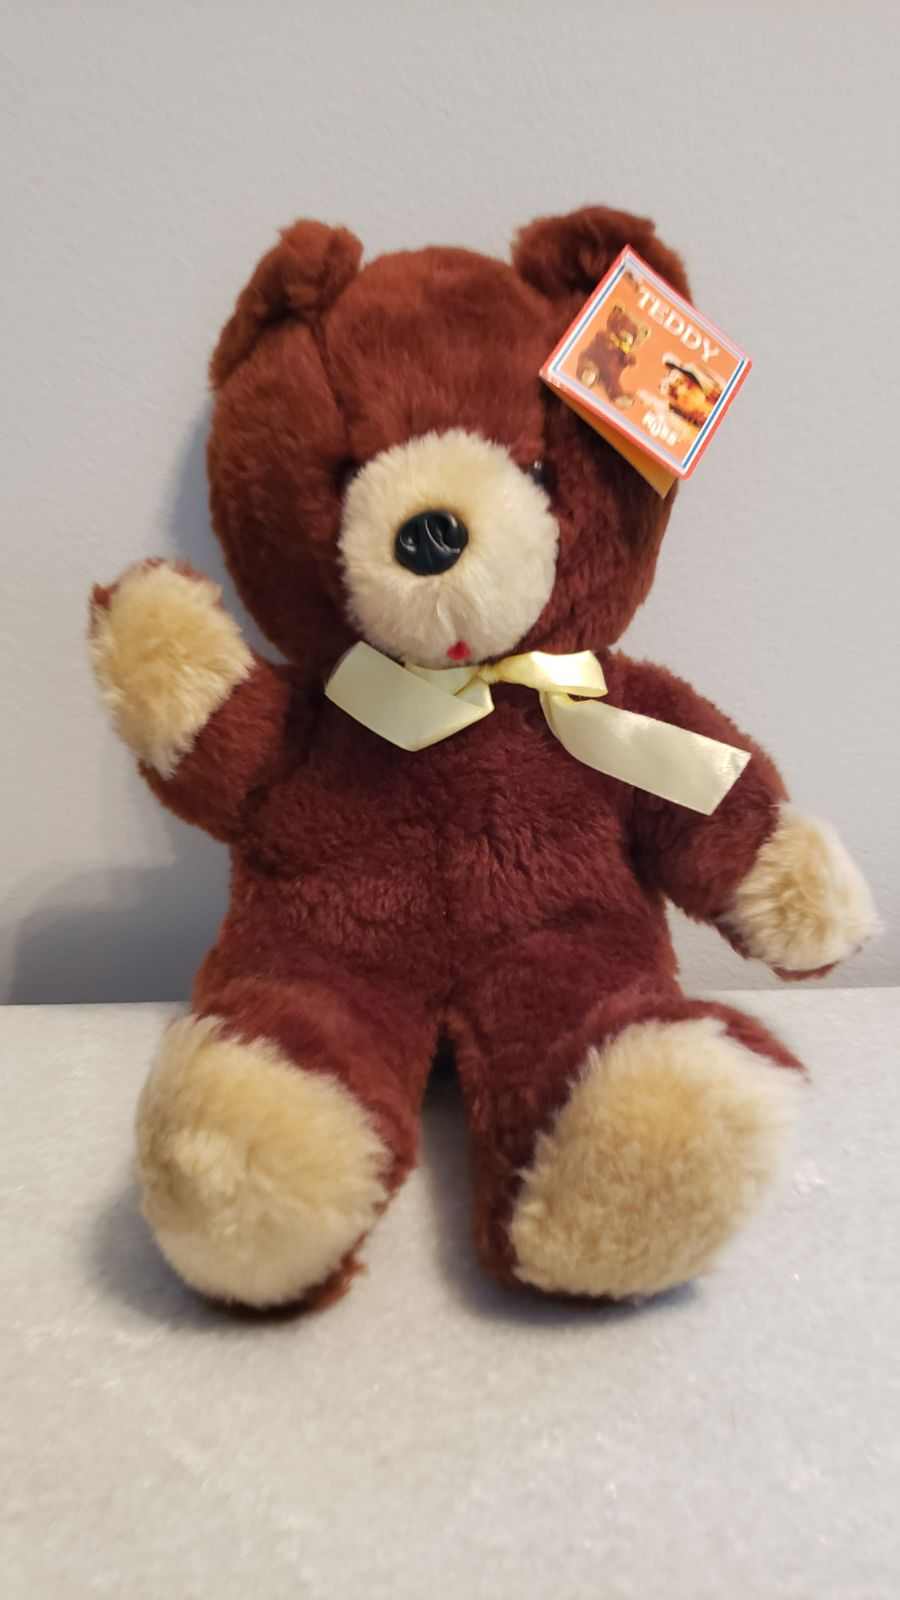 Vintage 1981 Russ Teddy Bear